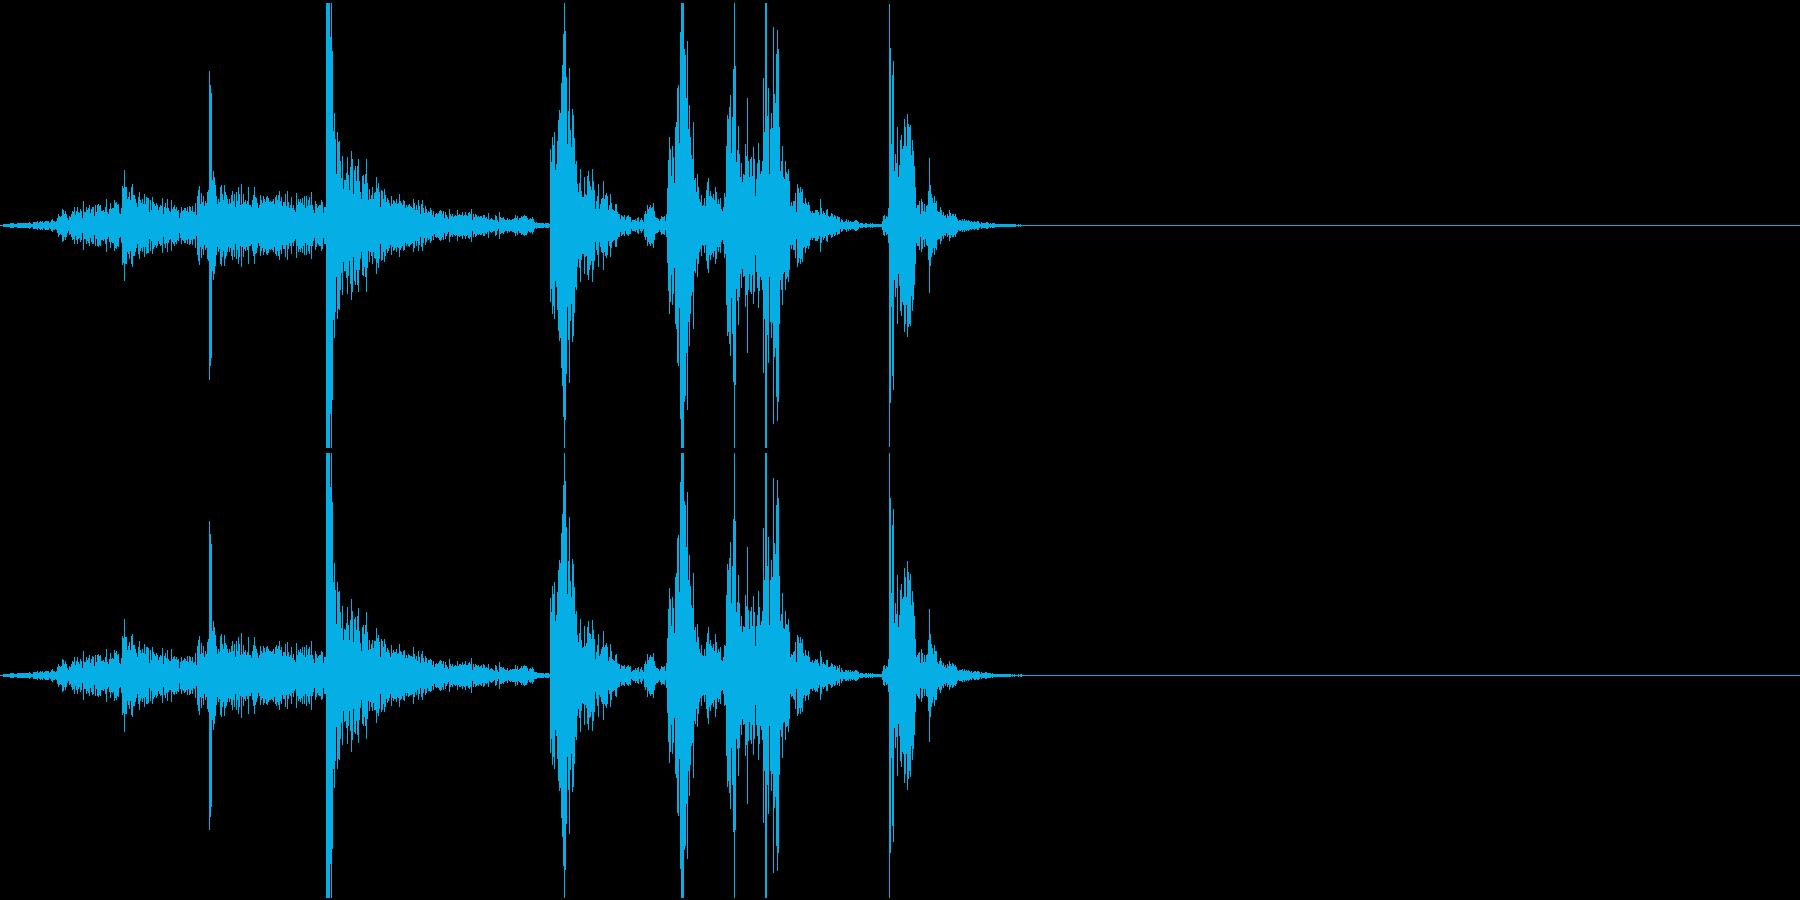 PaperNoise ページをめくる音の再生済みの波形